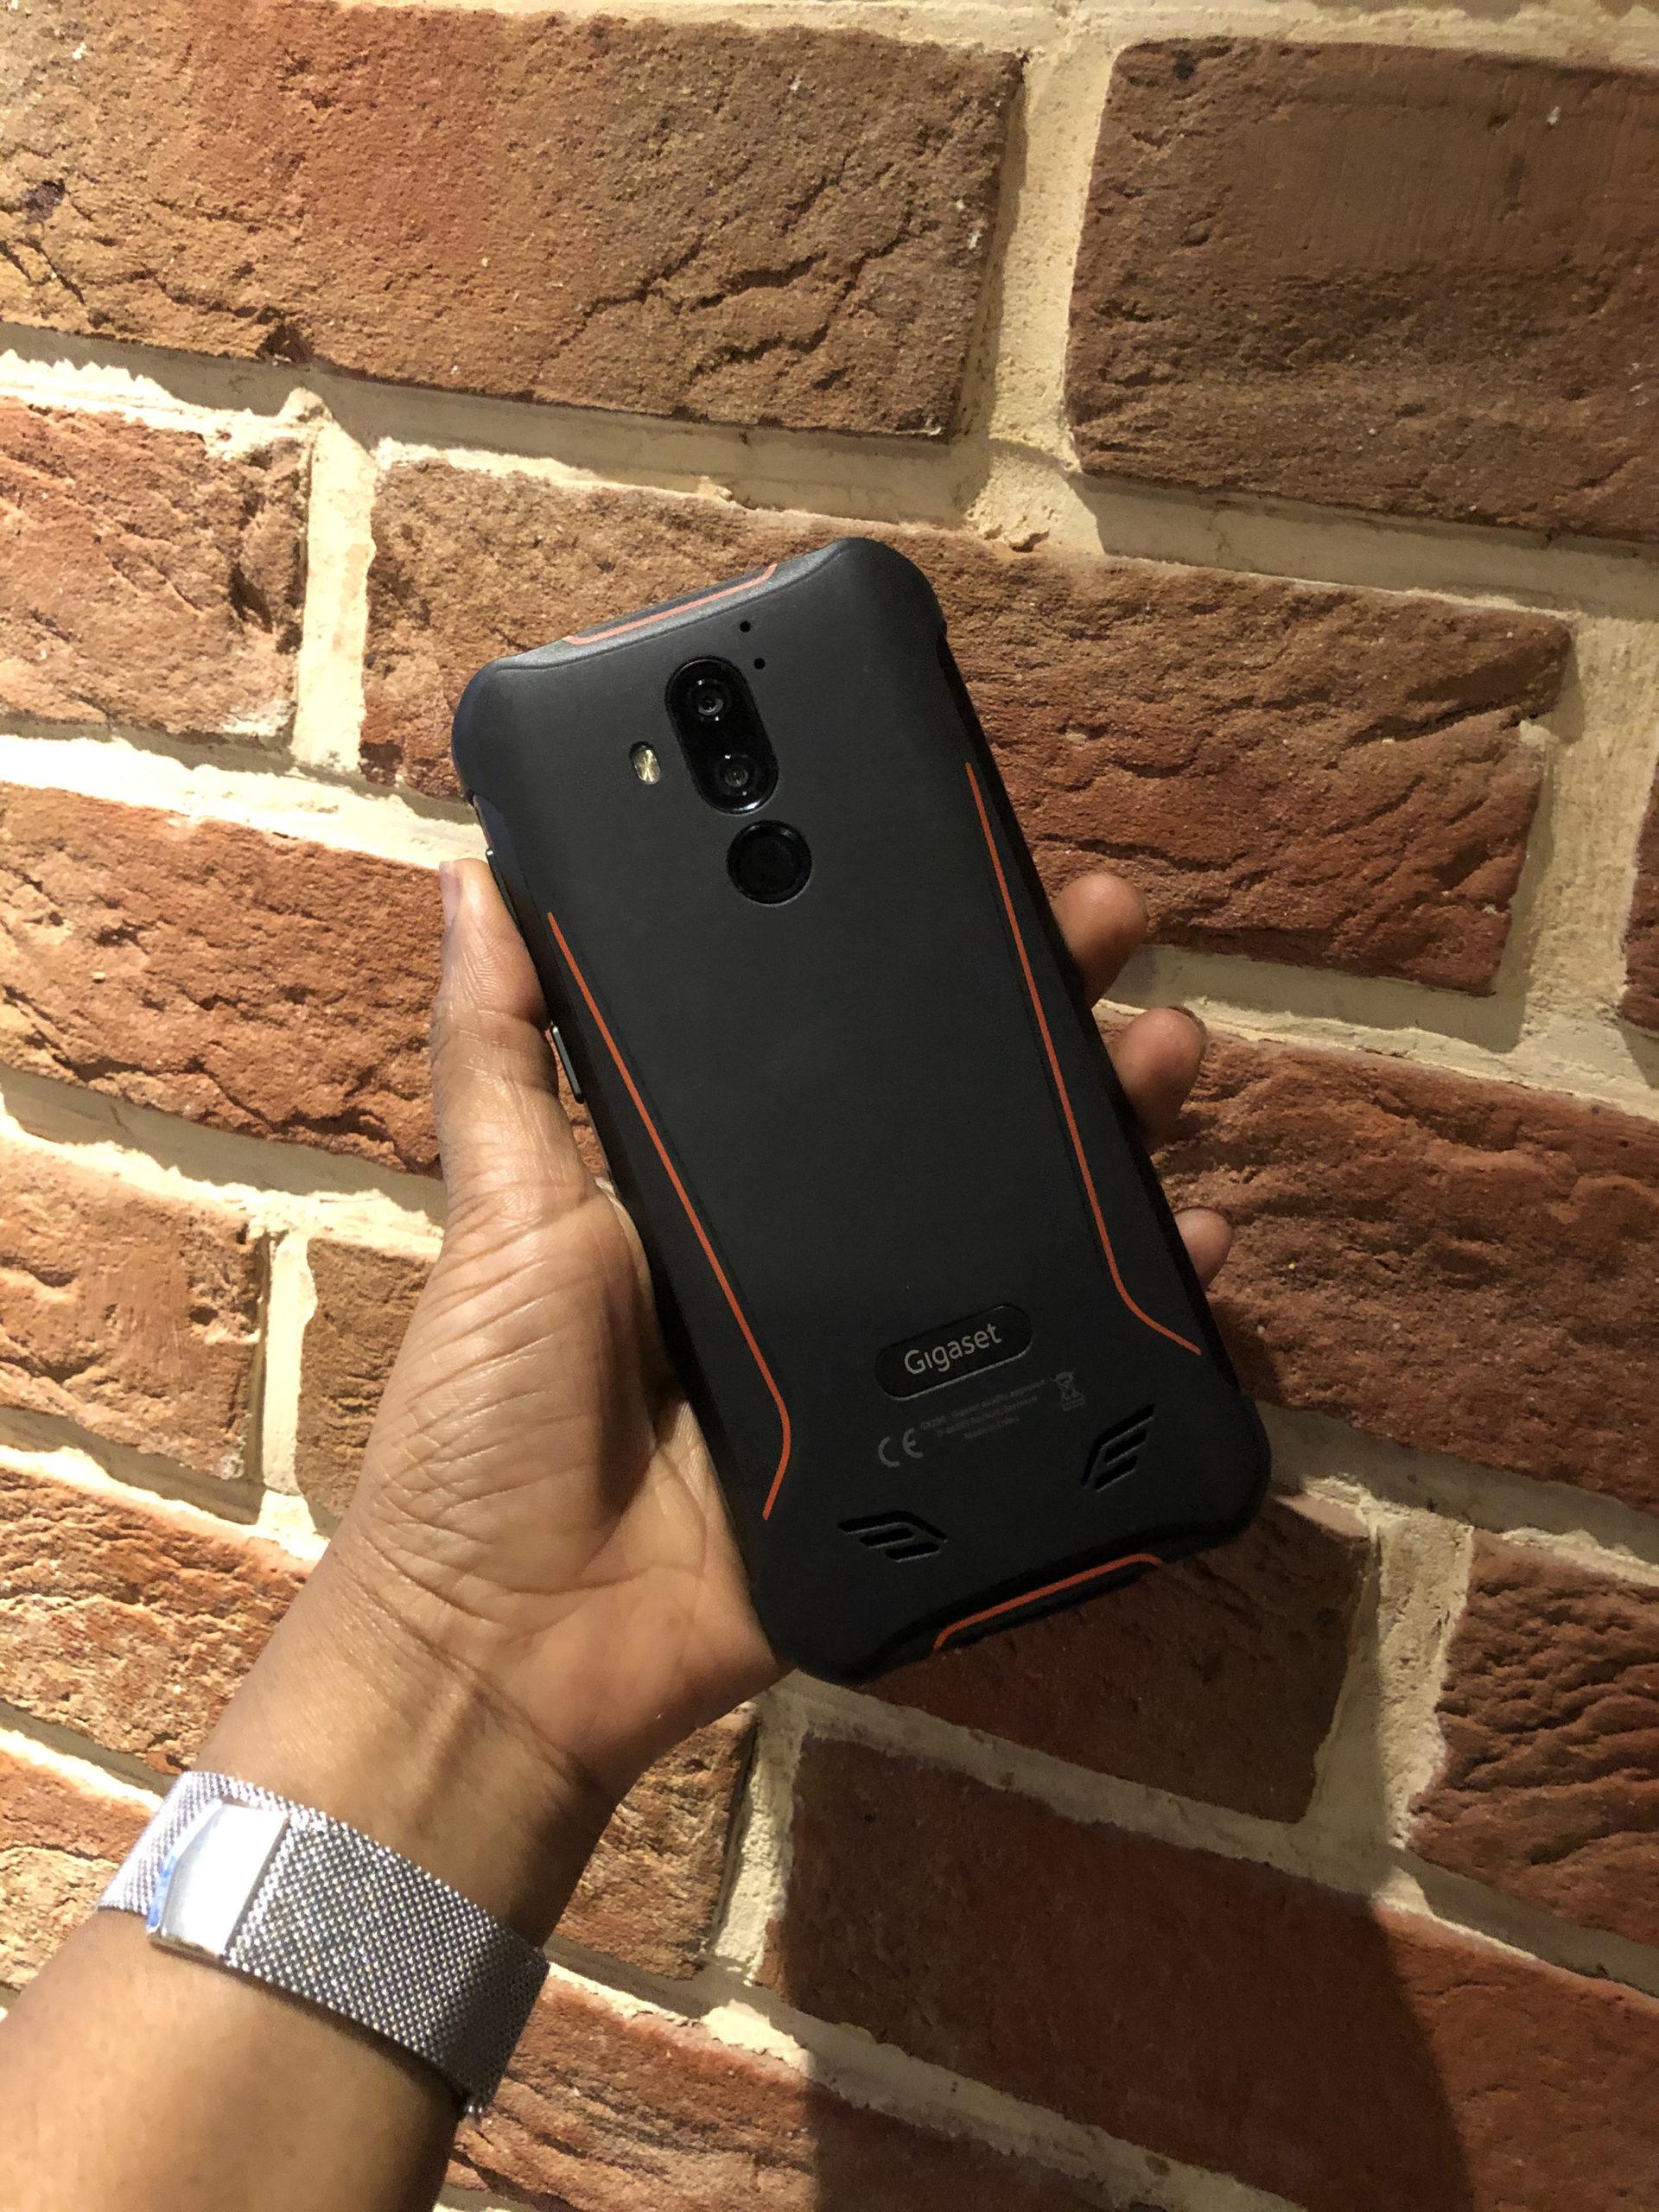 Gigaset GX290 smartphone 02